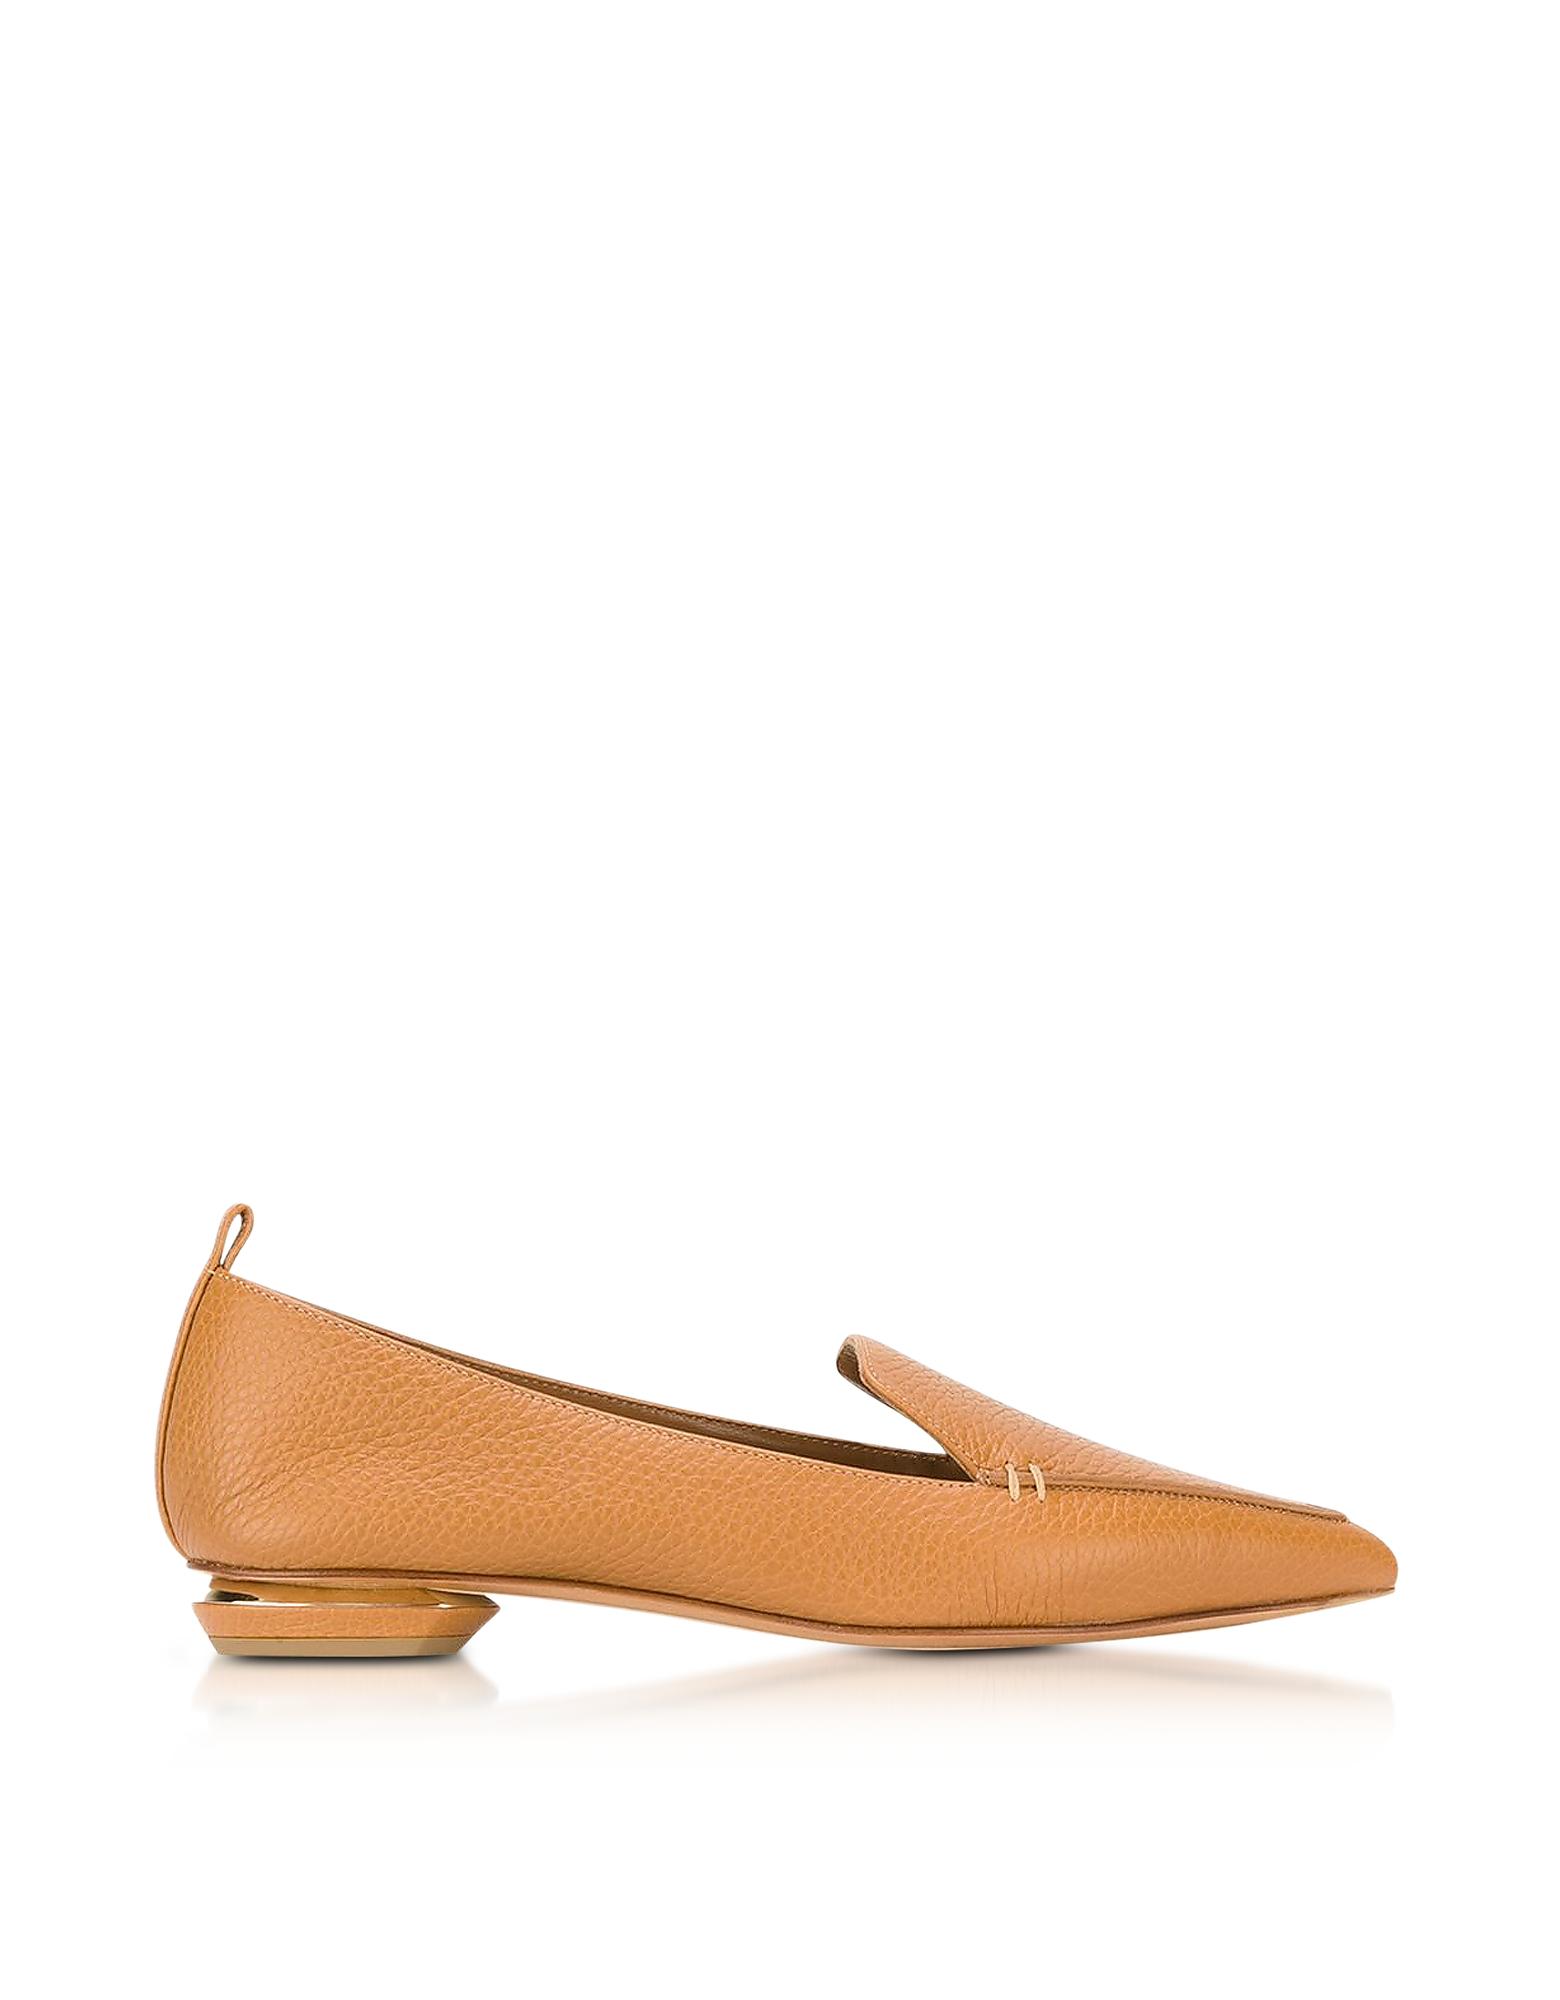 Nicholas Kirkwood Shoes, Beya Tan Leather Loafer